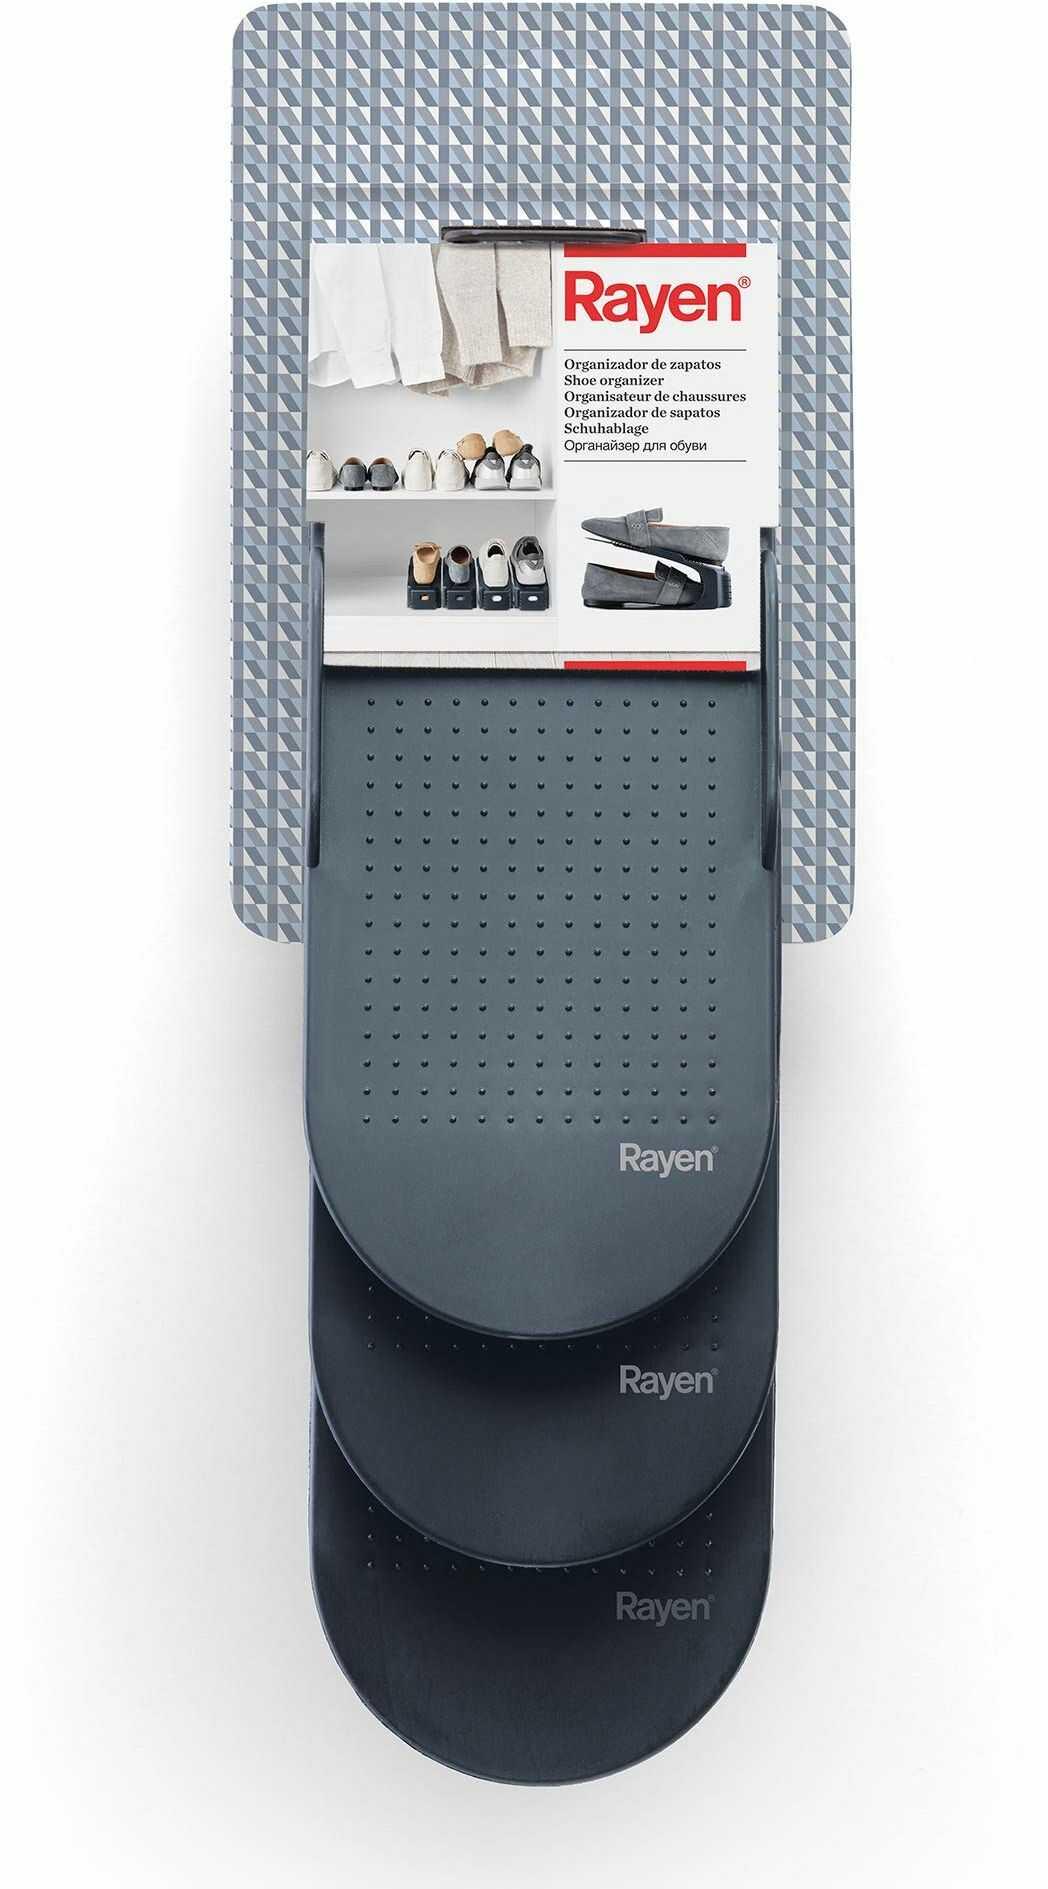 Rayen regał na buty, polipropylen, szary, 25 x 6,5 x 26 x 13 x 10 cm